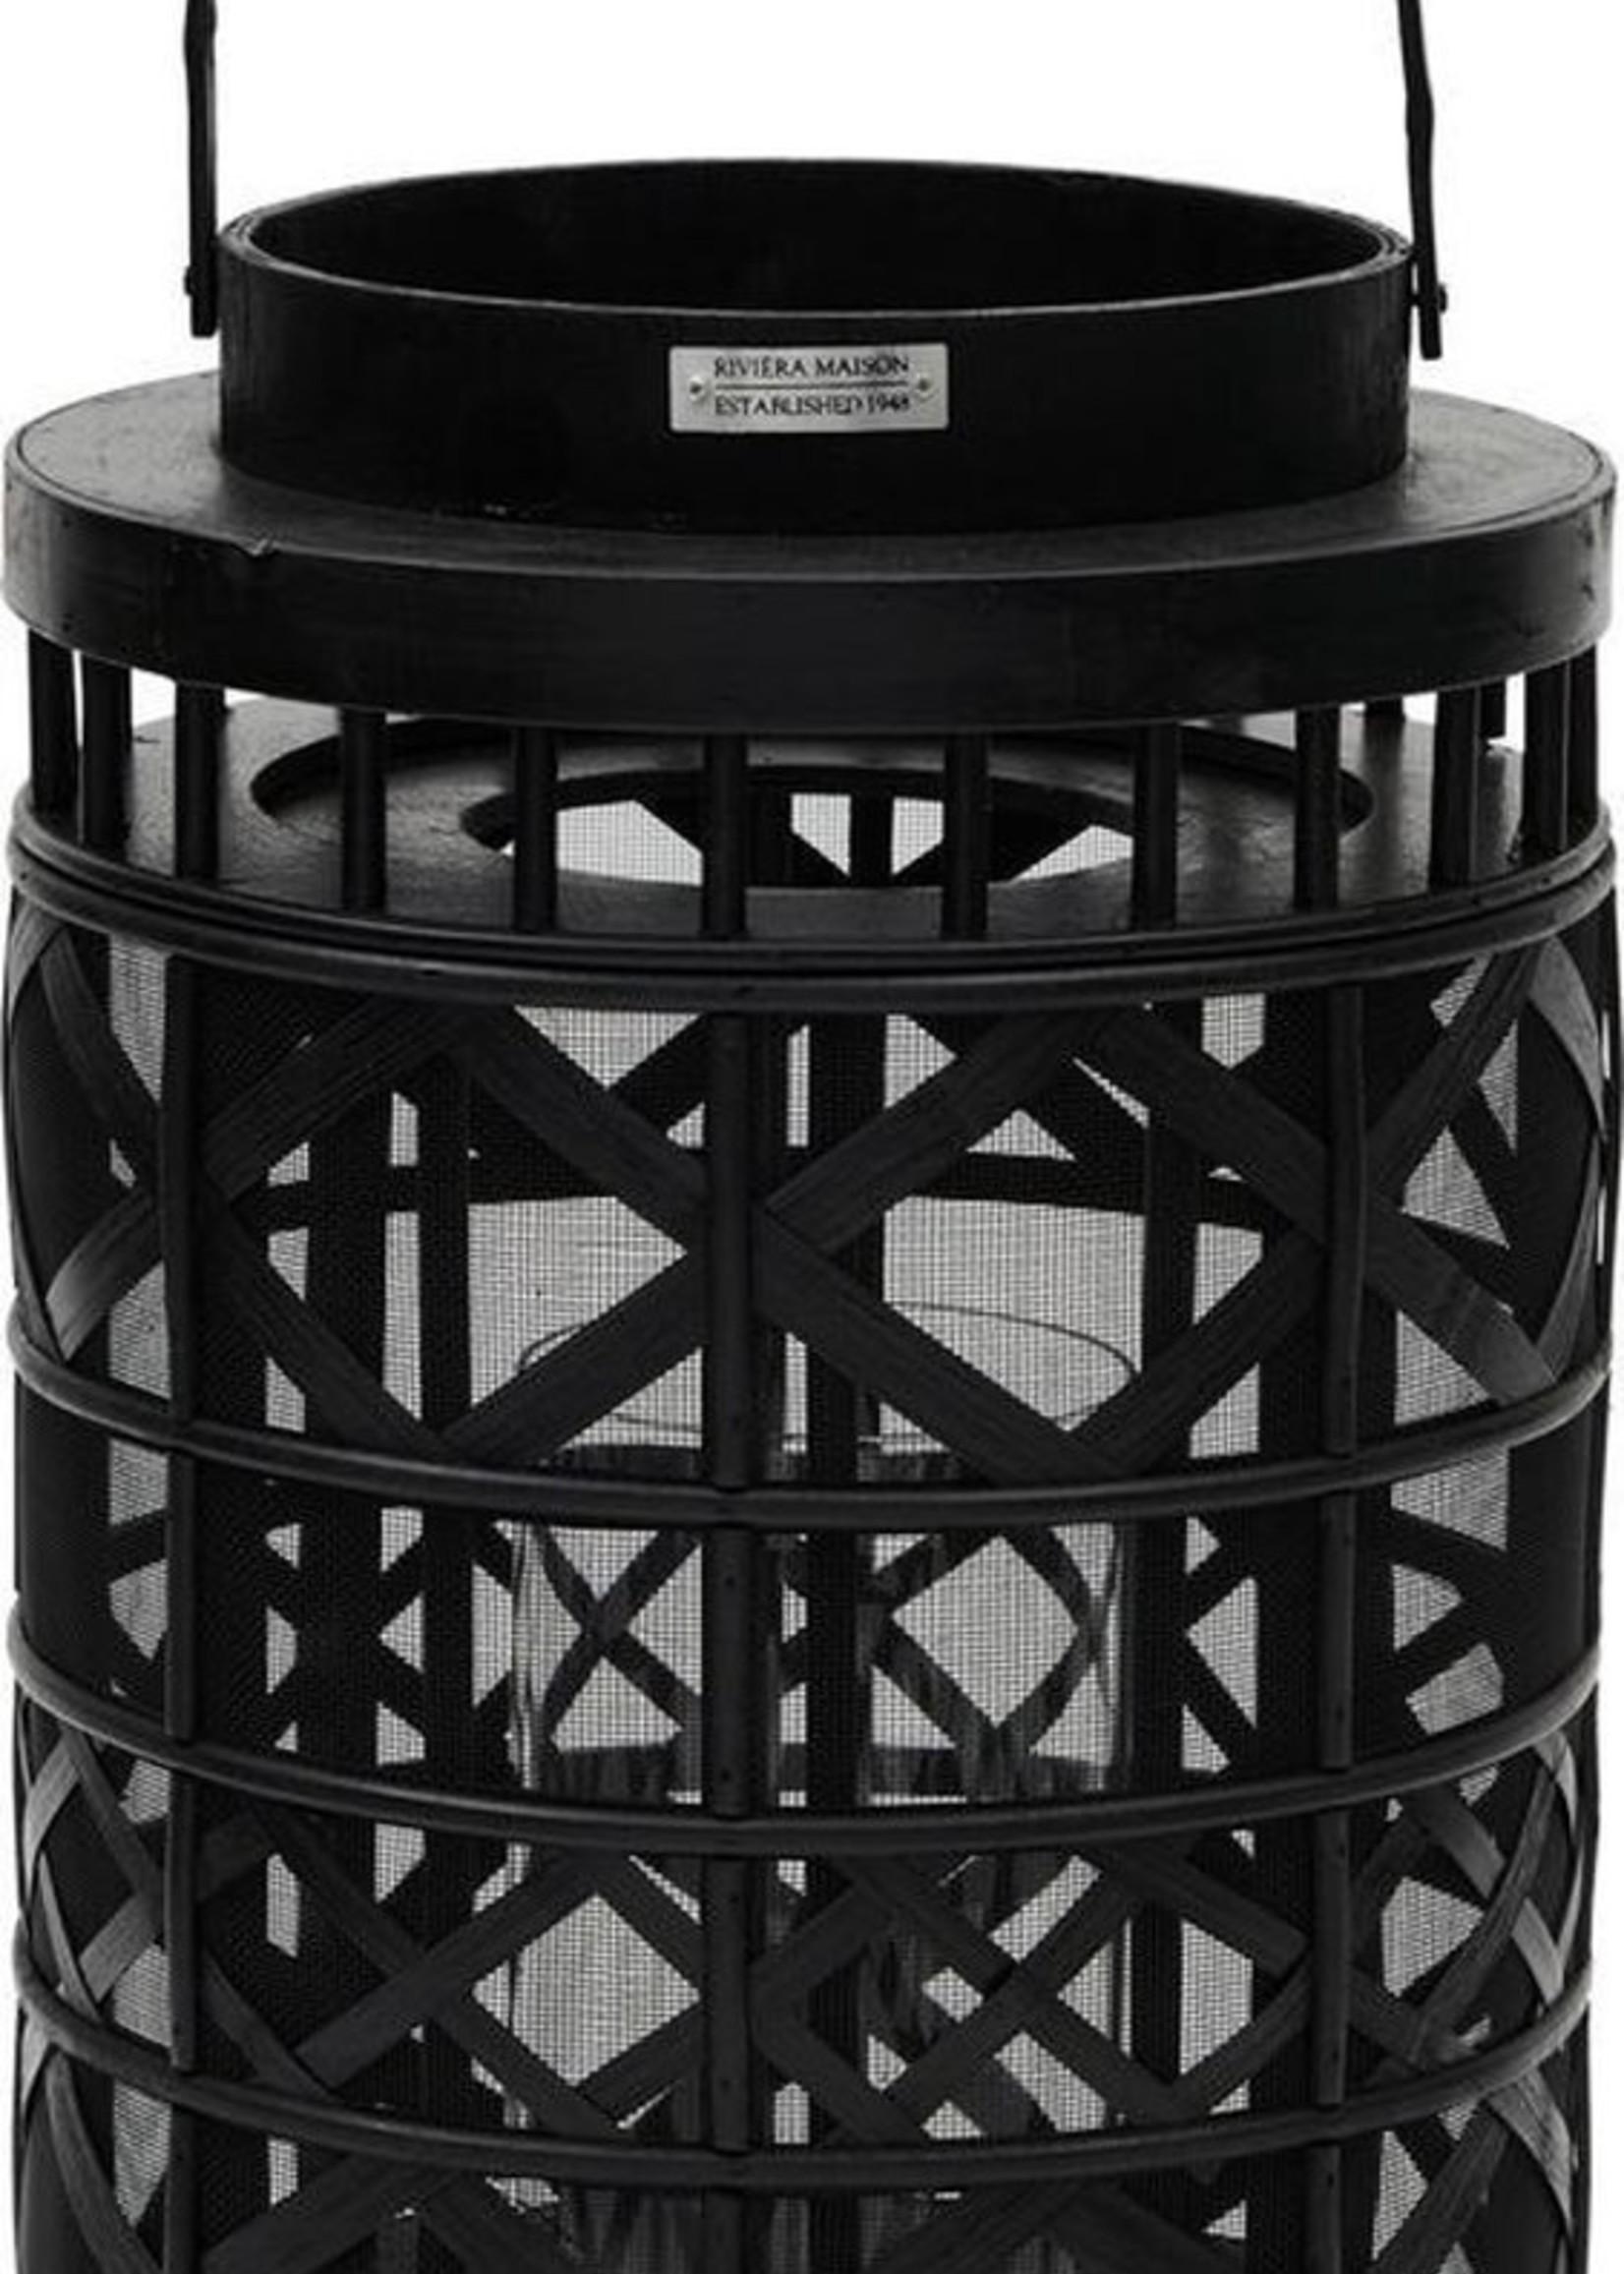 Riviera Maison New Hampshire Lantern S black